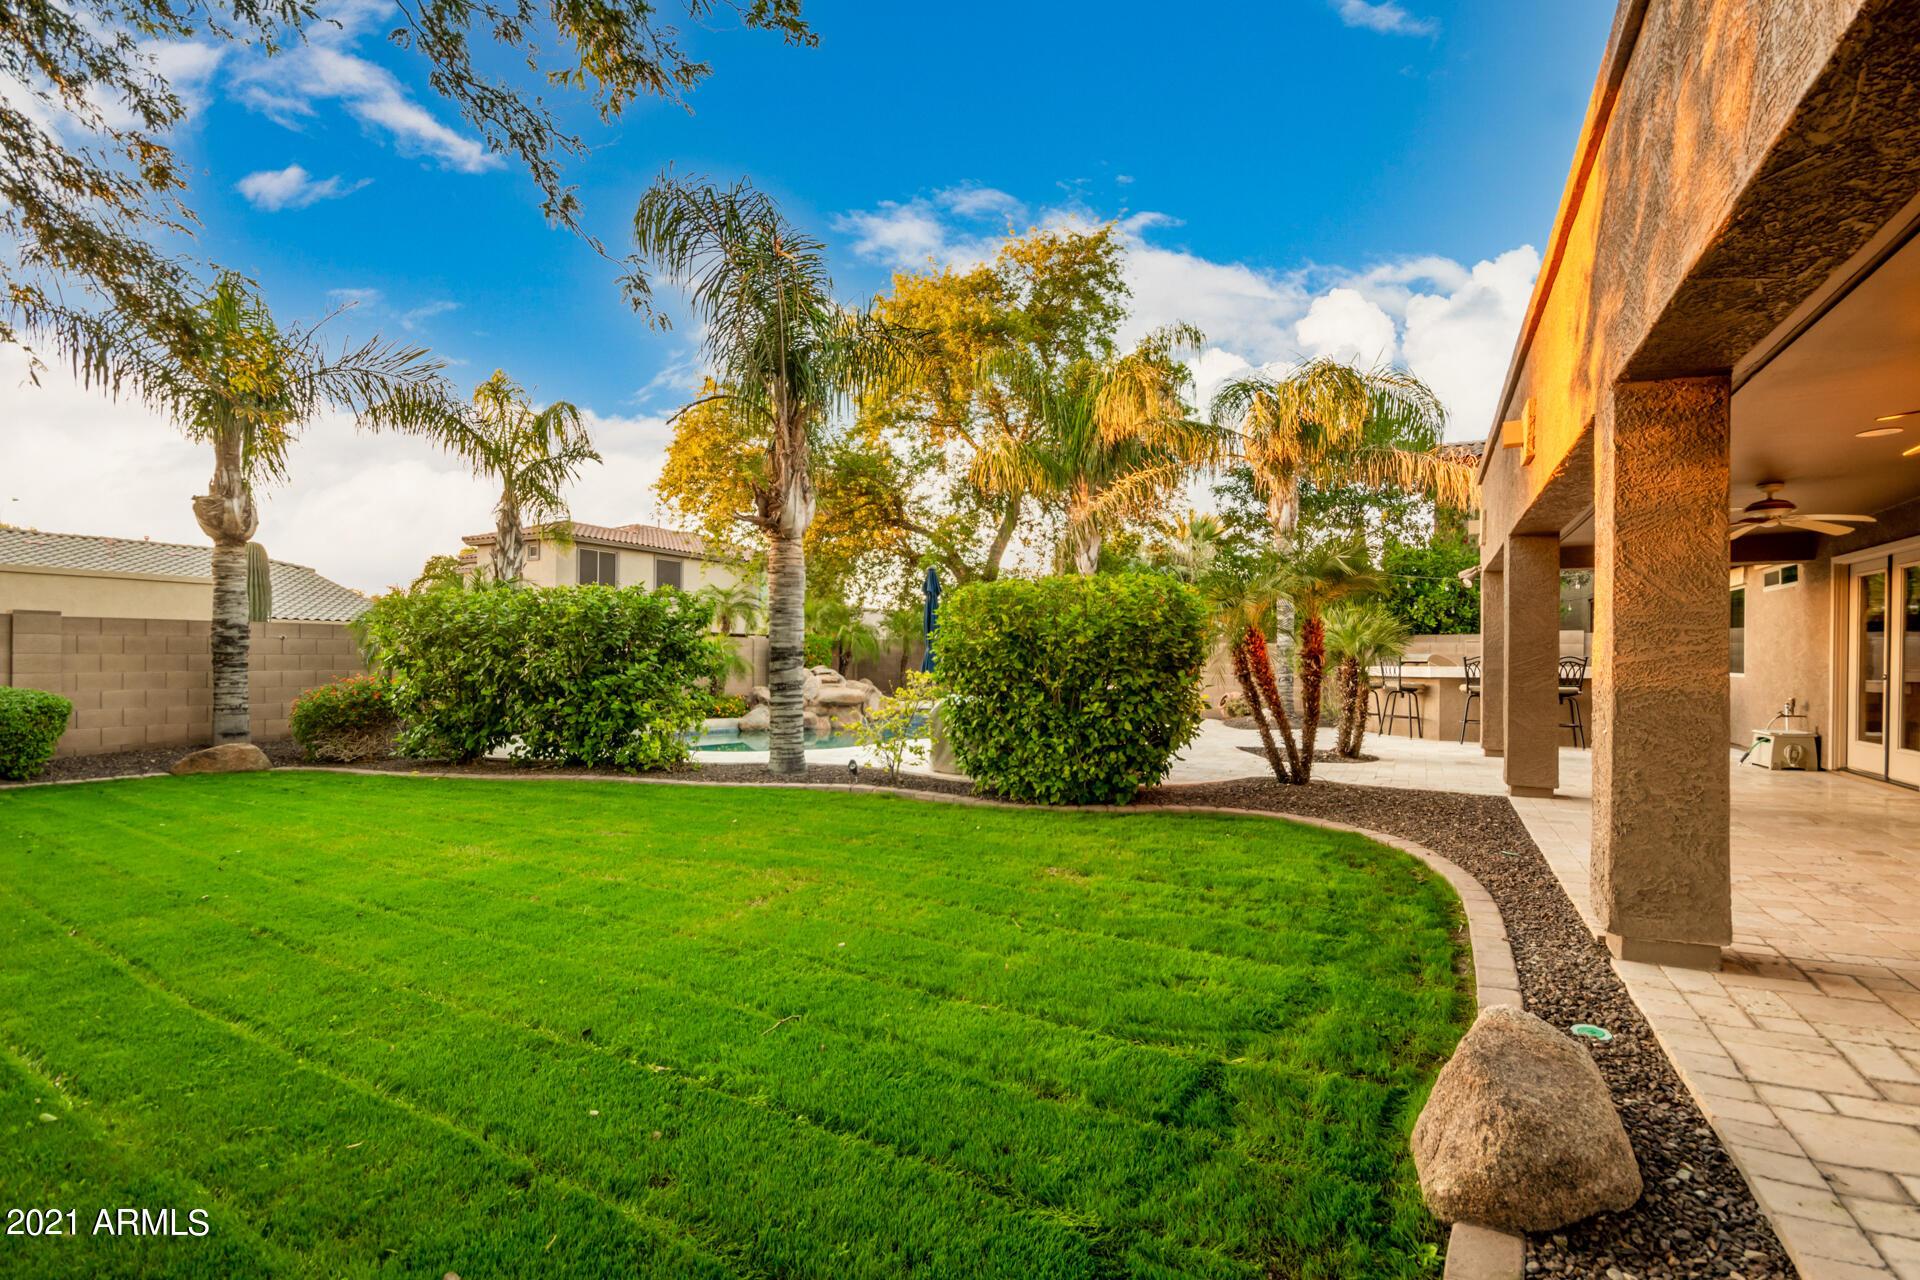 MLS 6310288 4266 S LINDL Drive, Chandler, AZ 85249 Chandler AZ Luxury